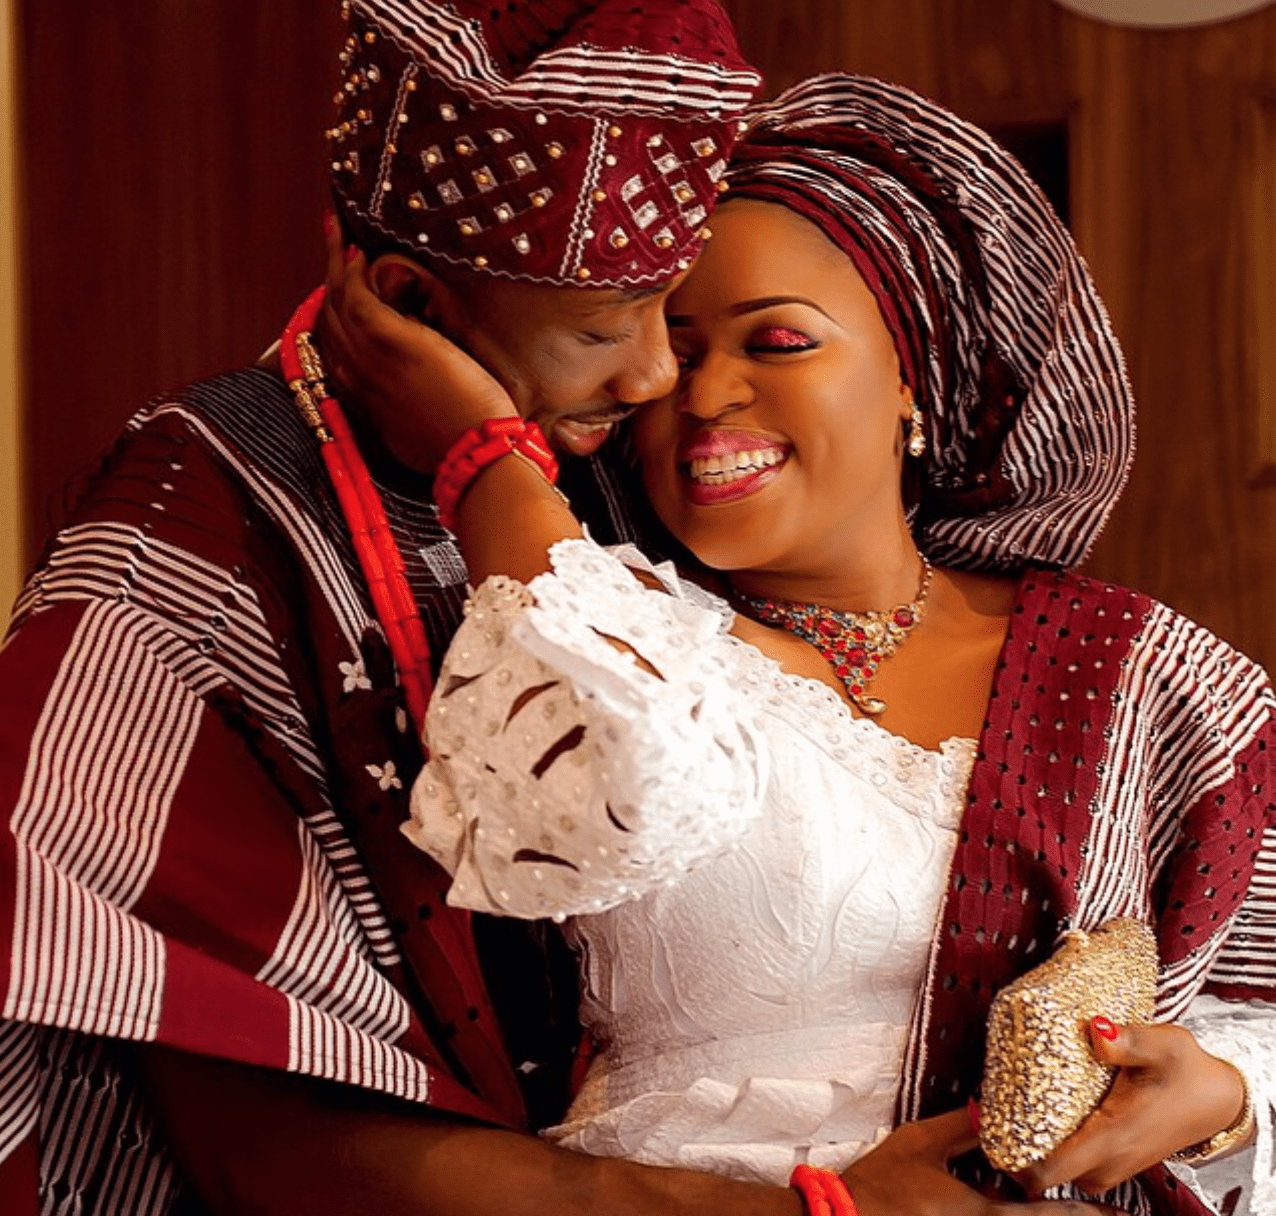 prince-farooq-bukola-weddingcapture-decran-2016-10-24-a-14-19-54